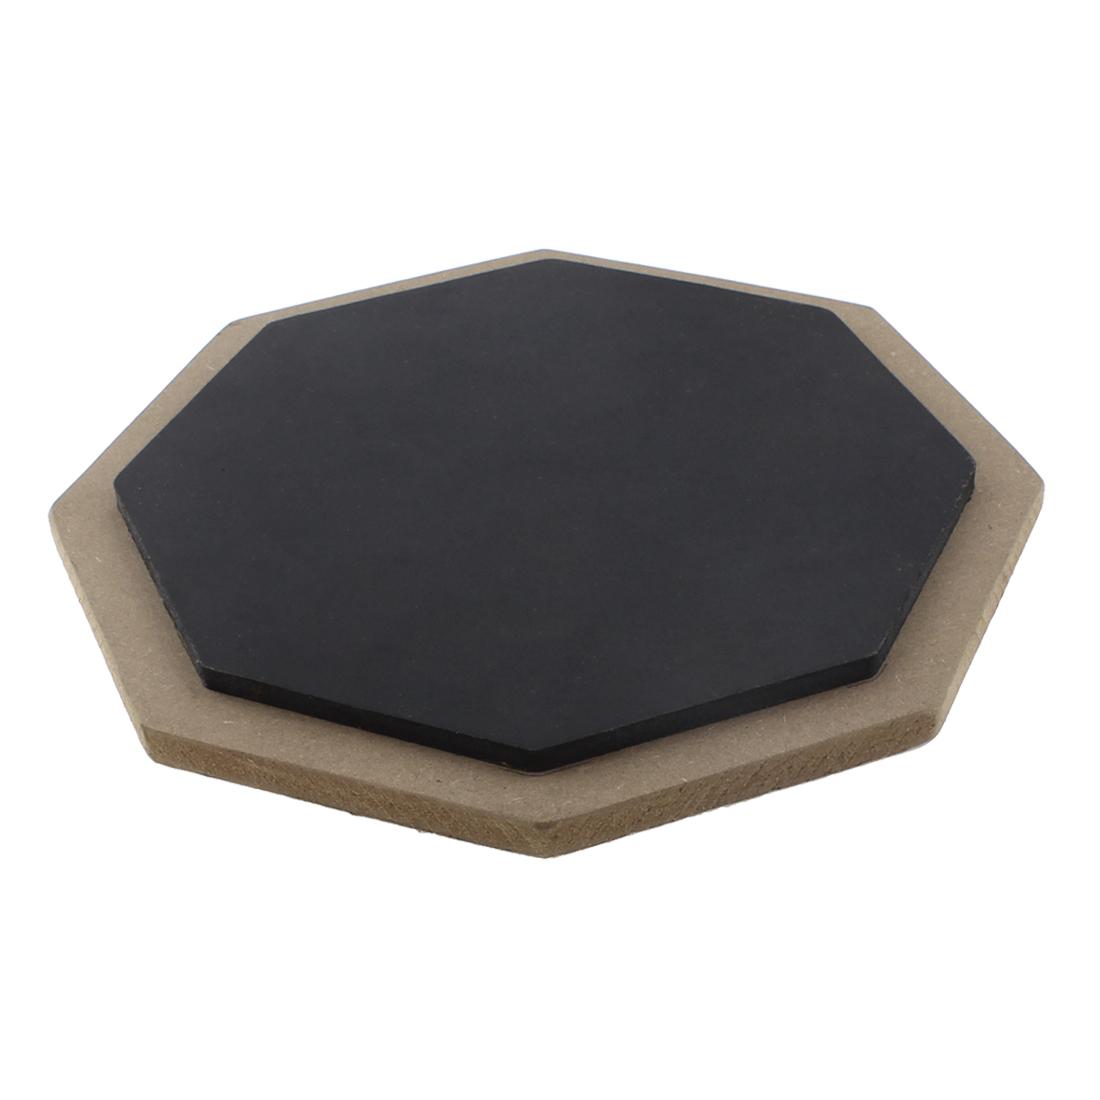 Octagon Shaped Single Sided Training Mute Drum Practice Pad Black